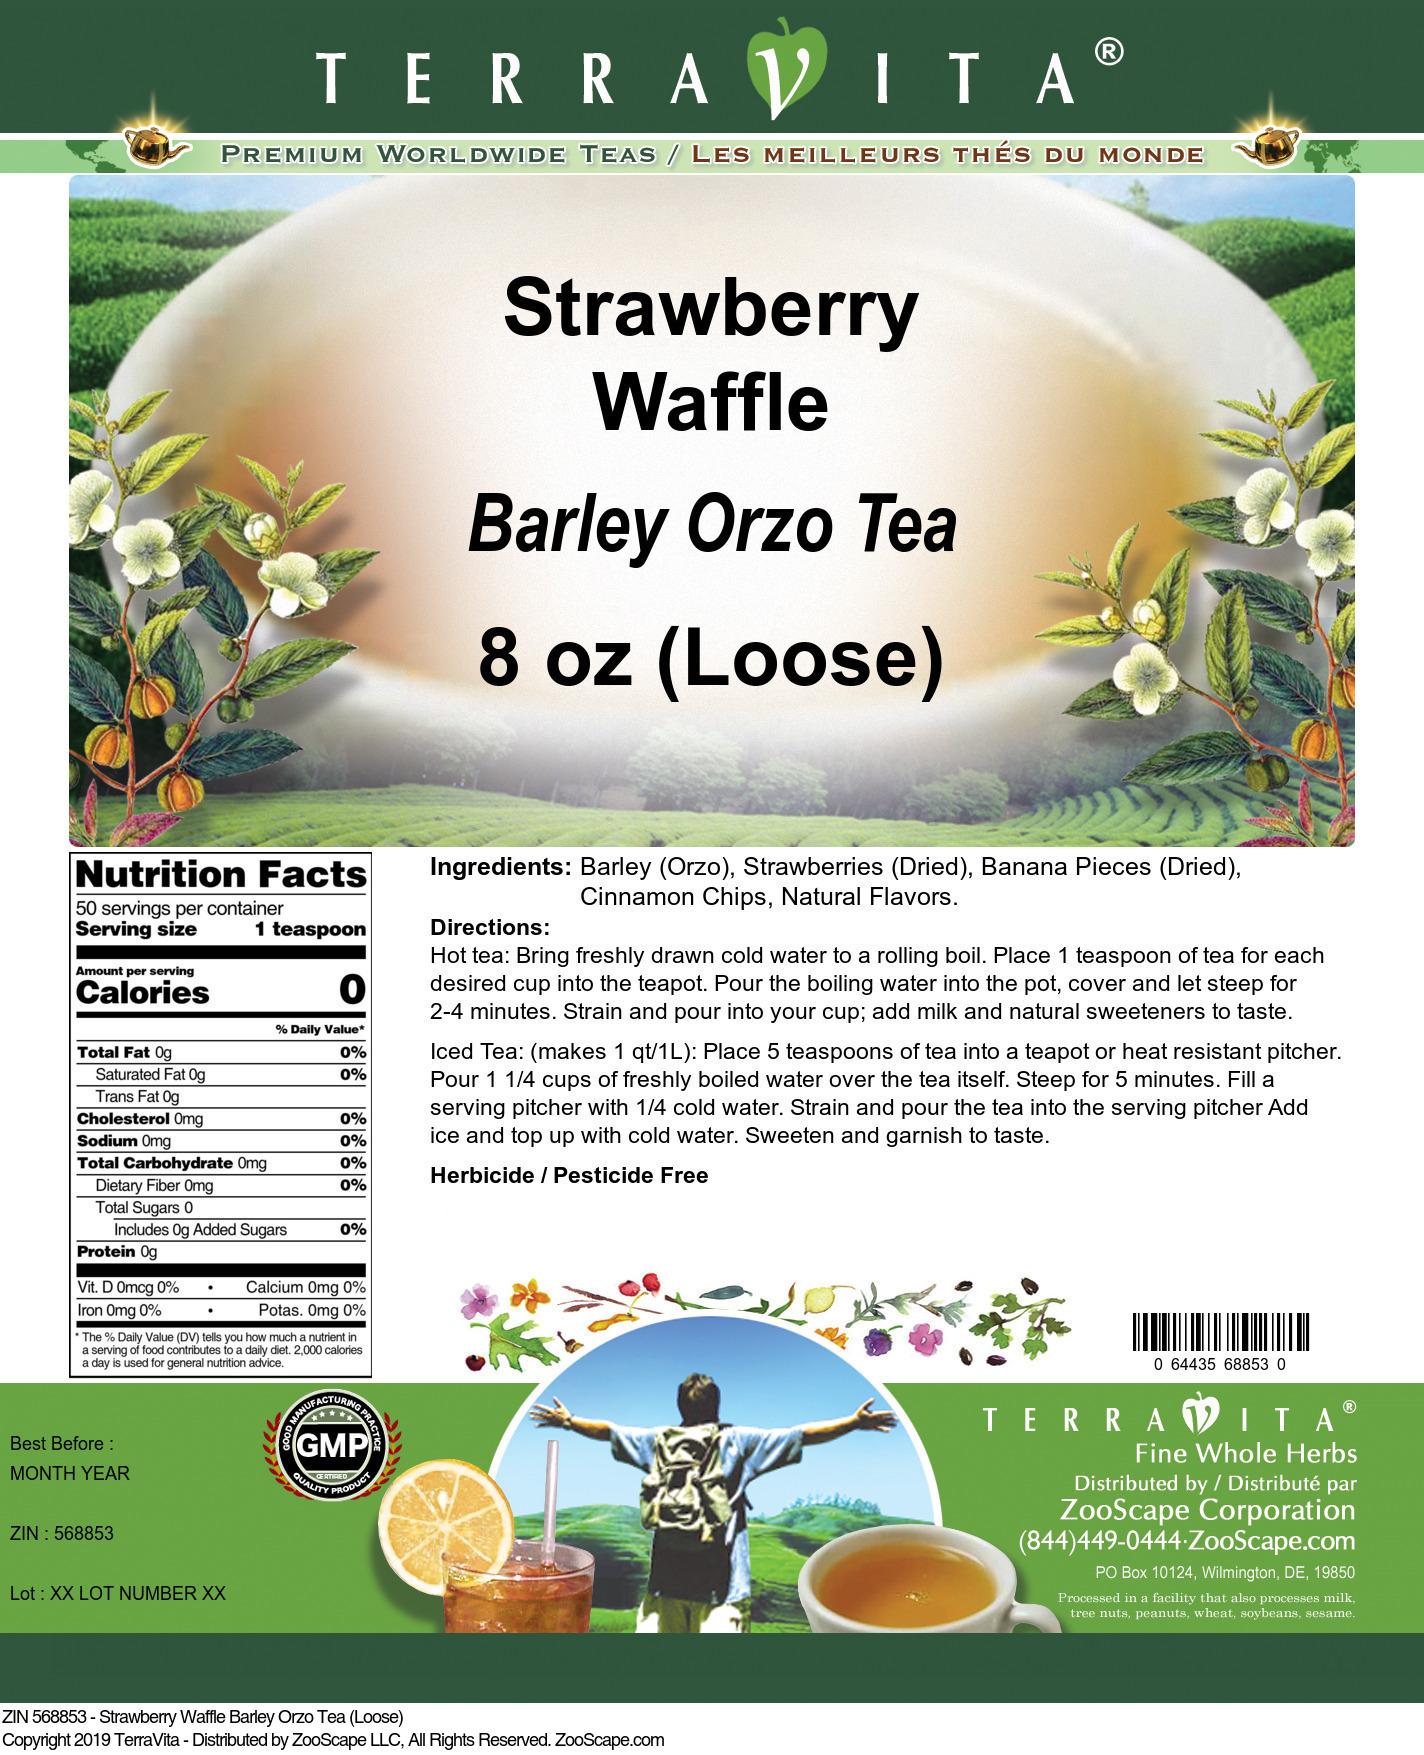 Strawberry Waffle Barley Orzo